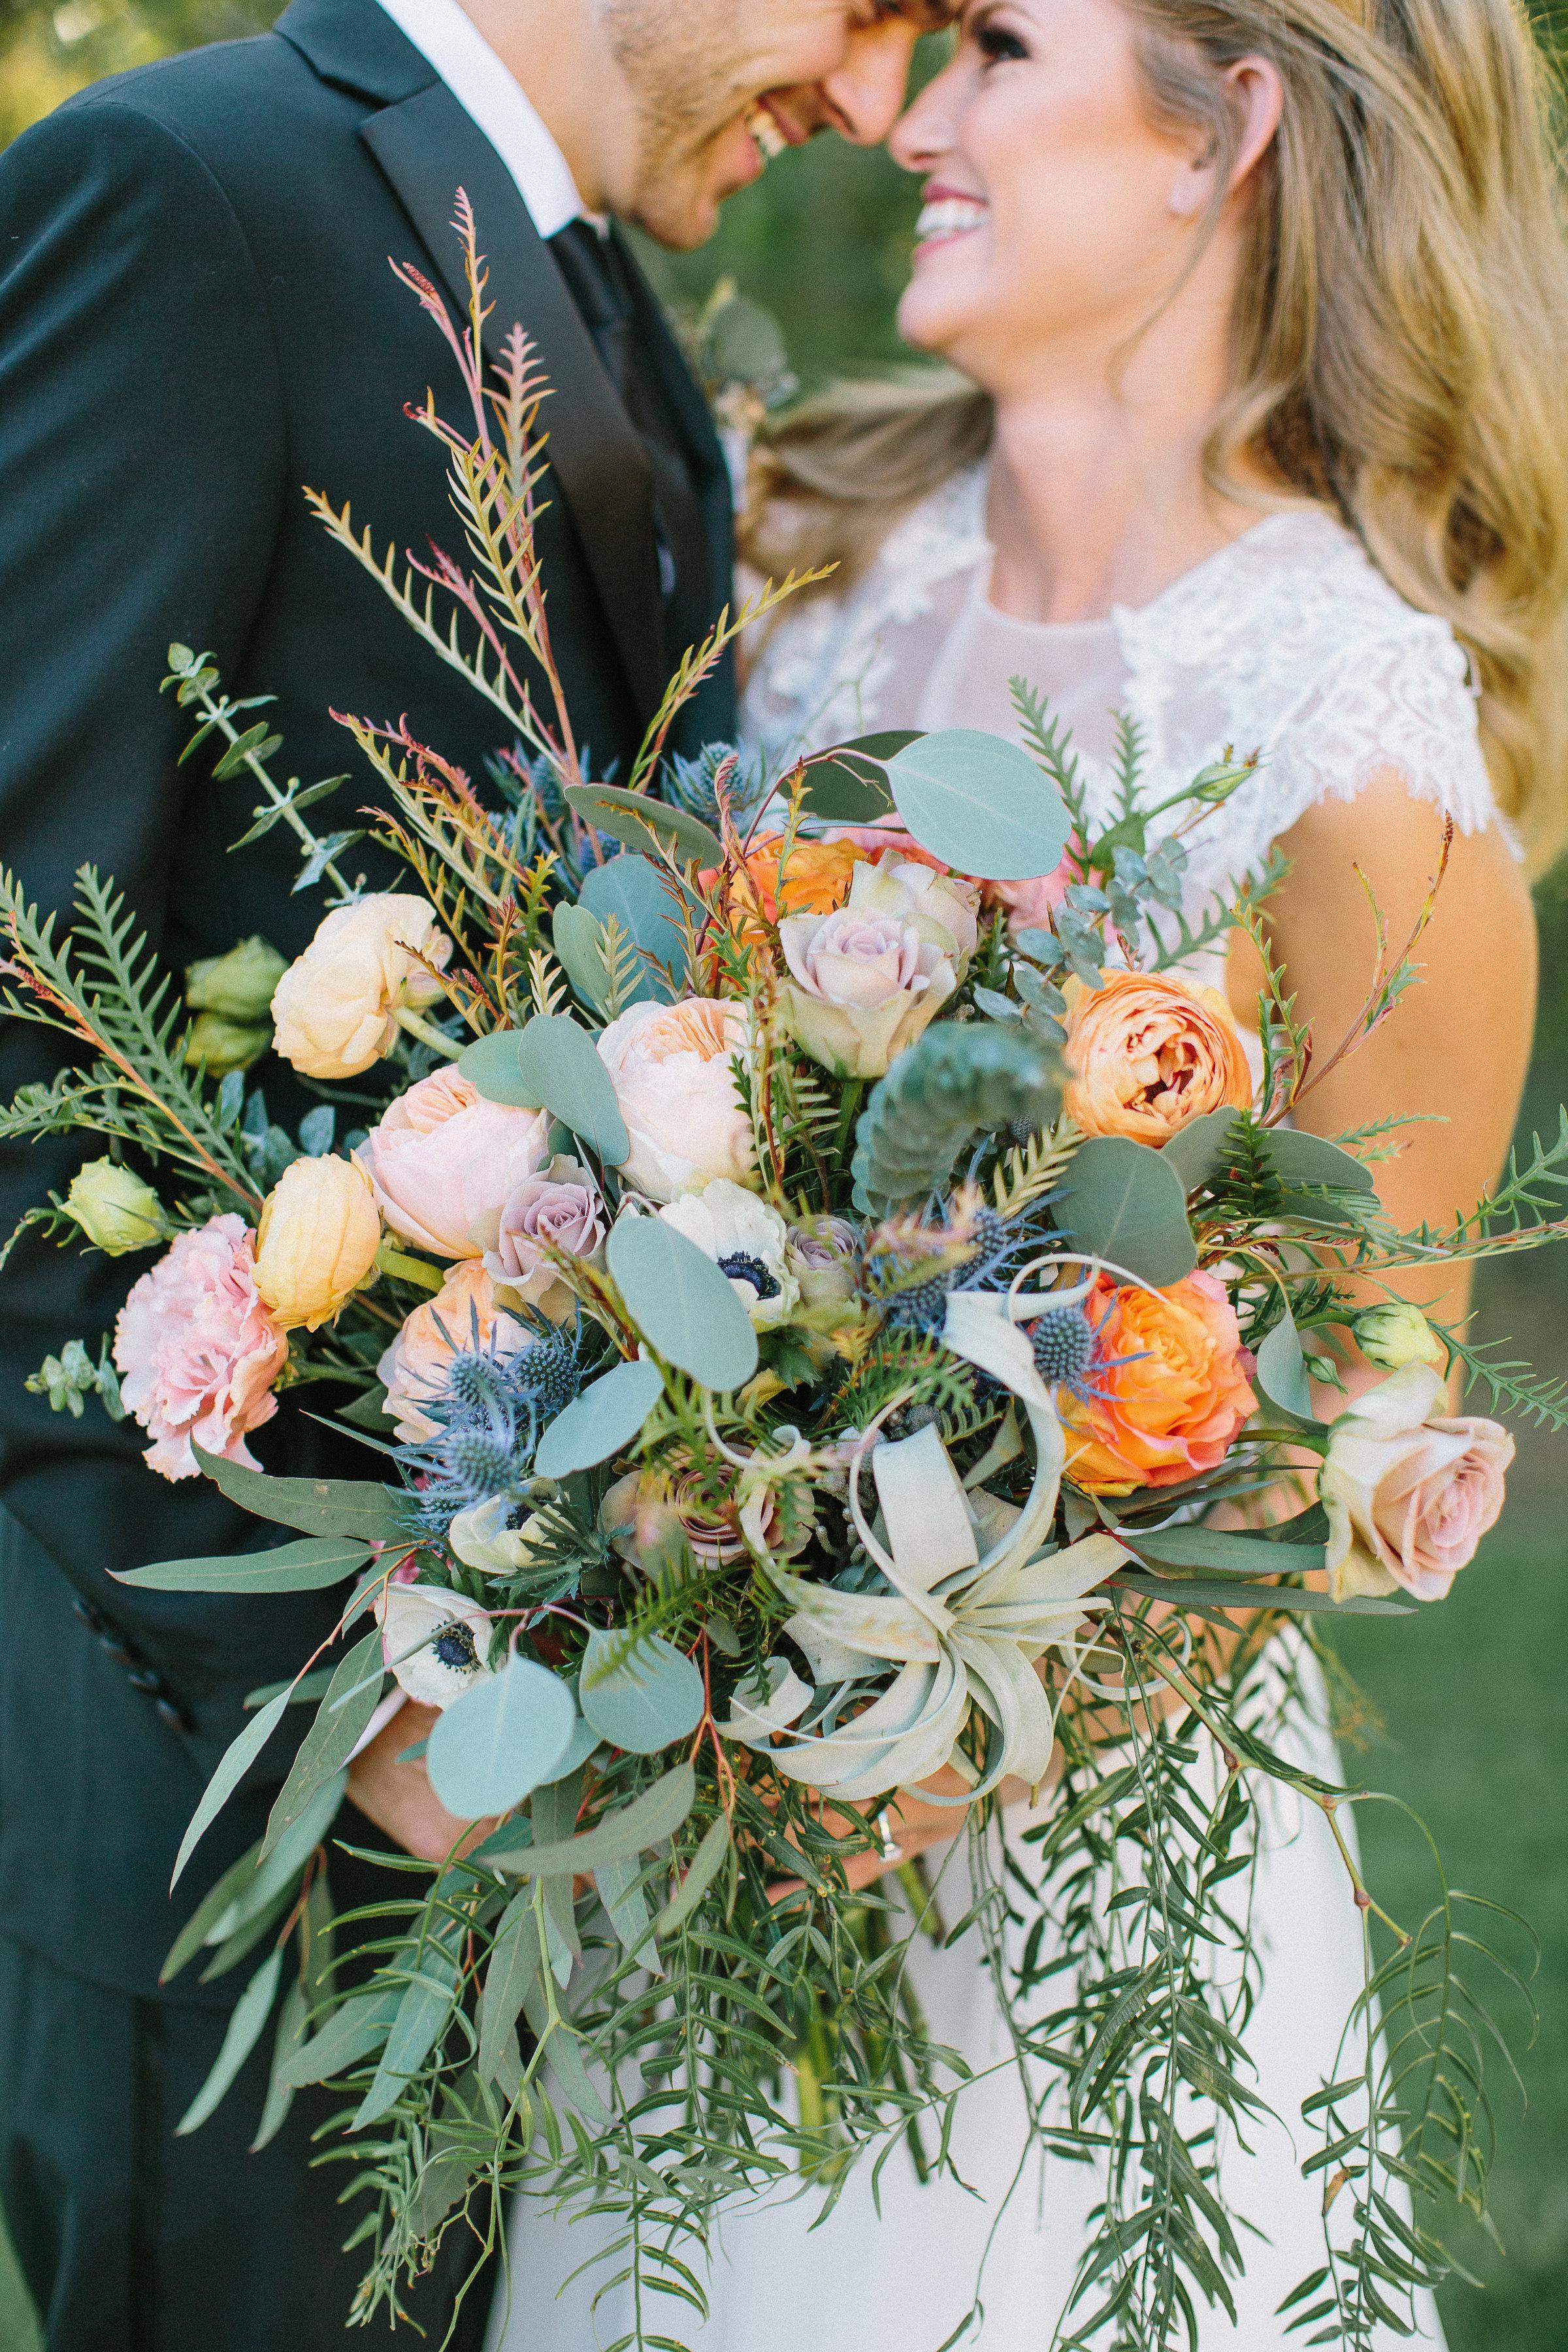 Ellen-Ashton-Photography-Peach-Creek-Ranch-Weddings-Wed-and-Prosper234